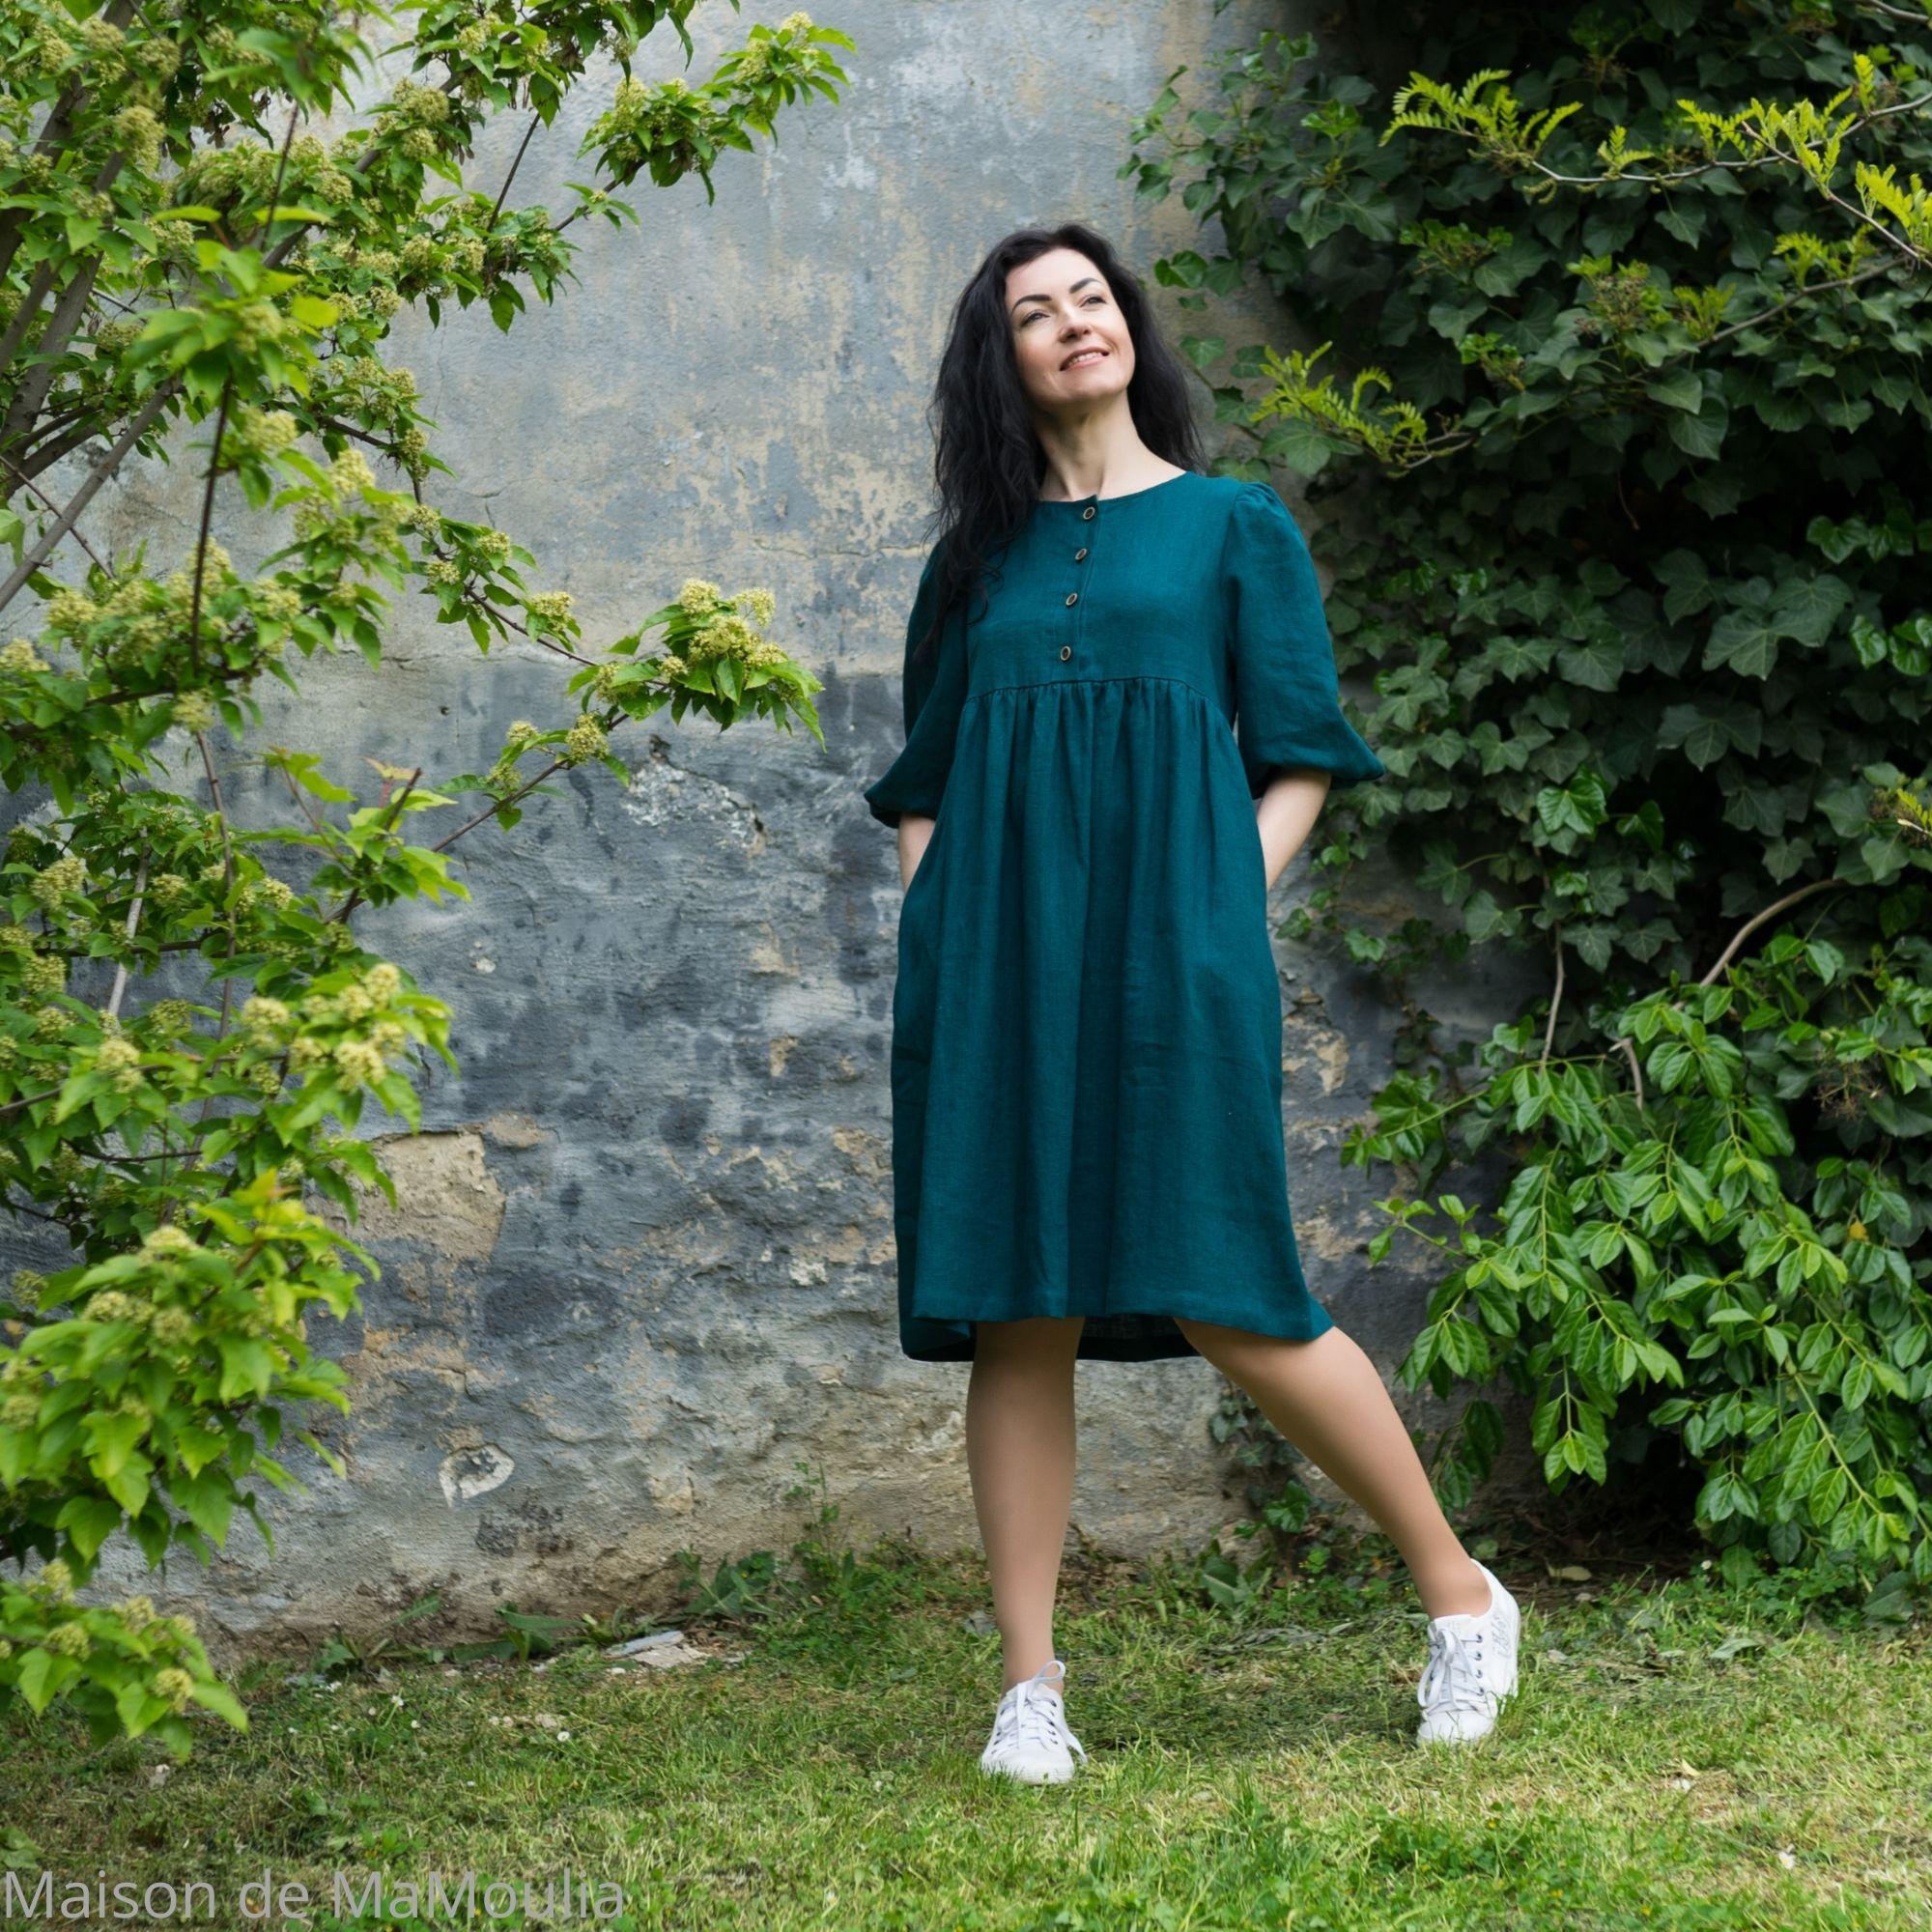 OFFON - Robe midi -manches ballon - 100% lin lavé-turquoise foncé